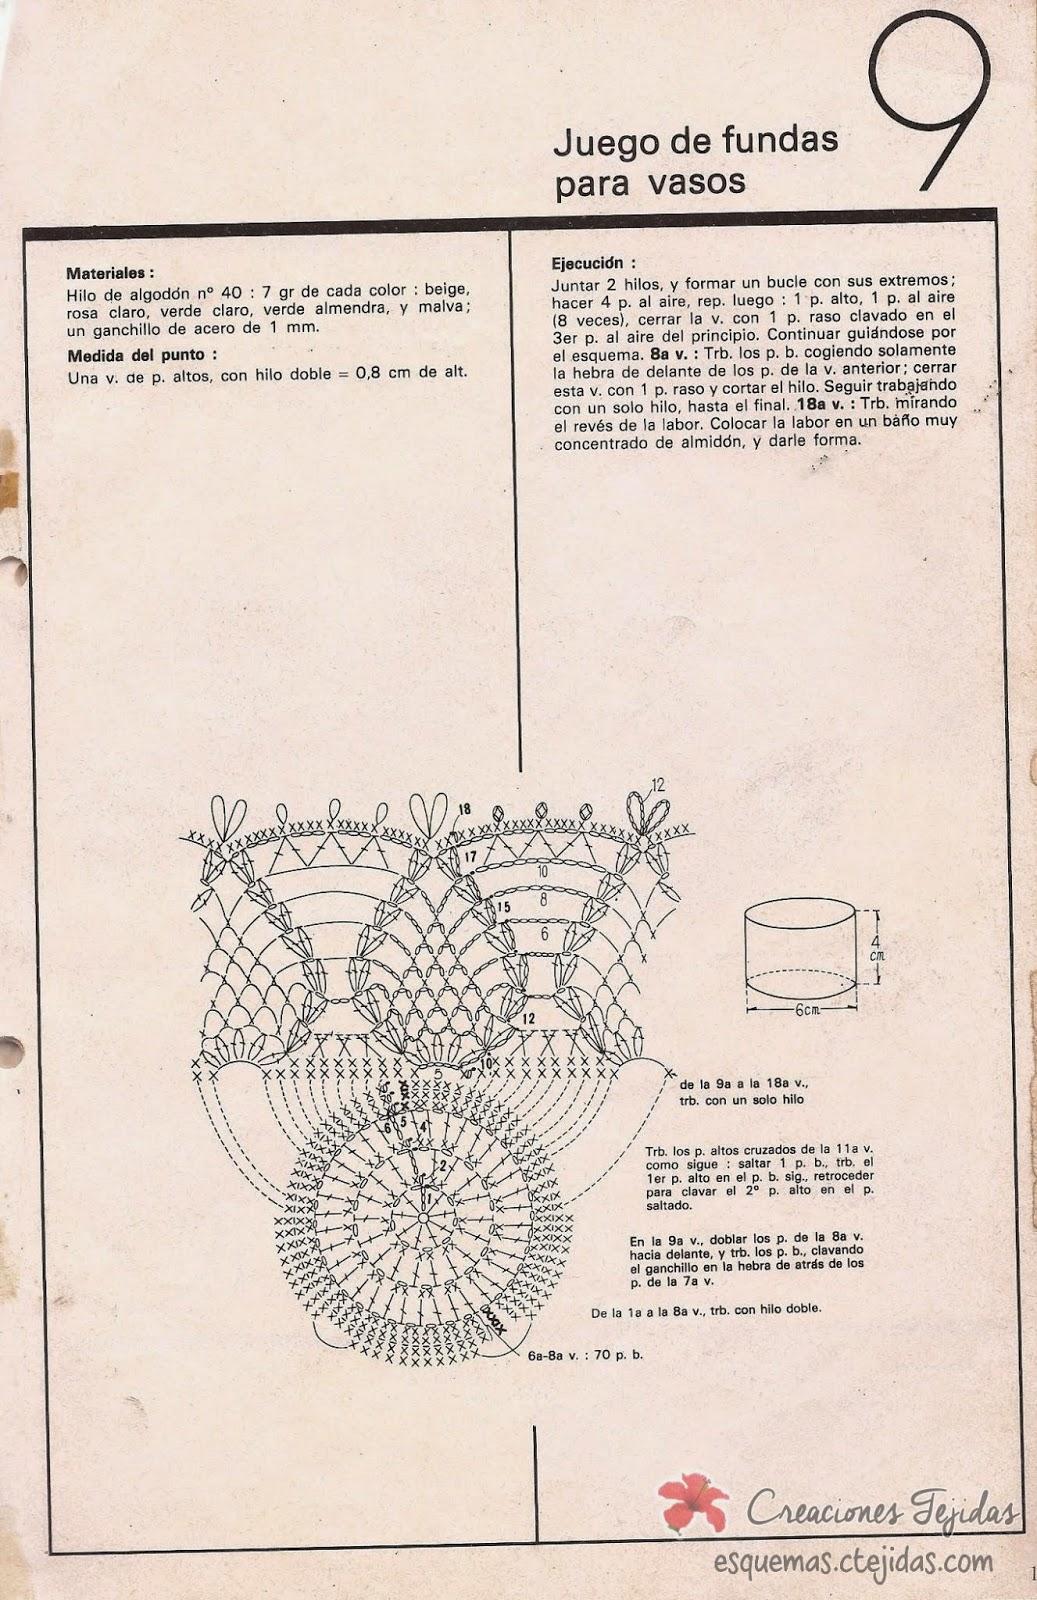 Juego de Fundas para Vasos a Crochet